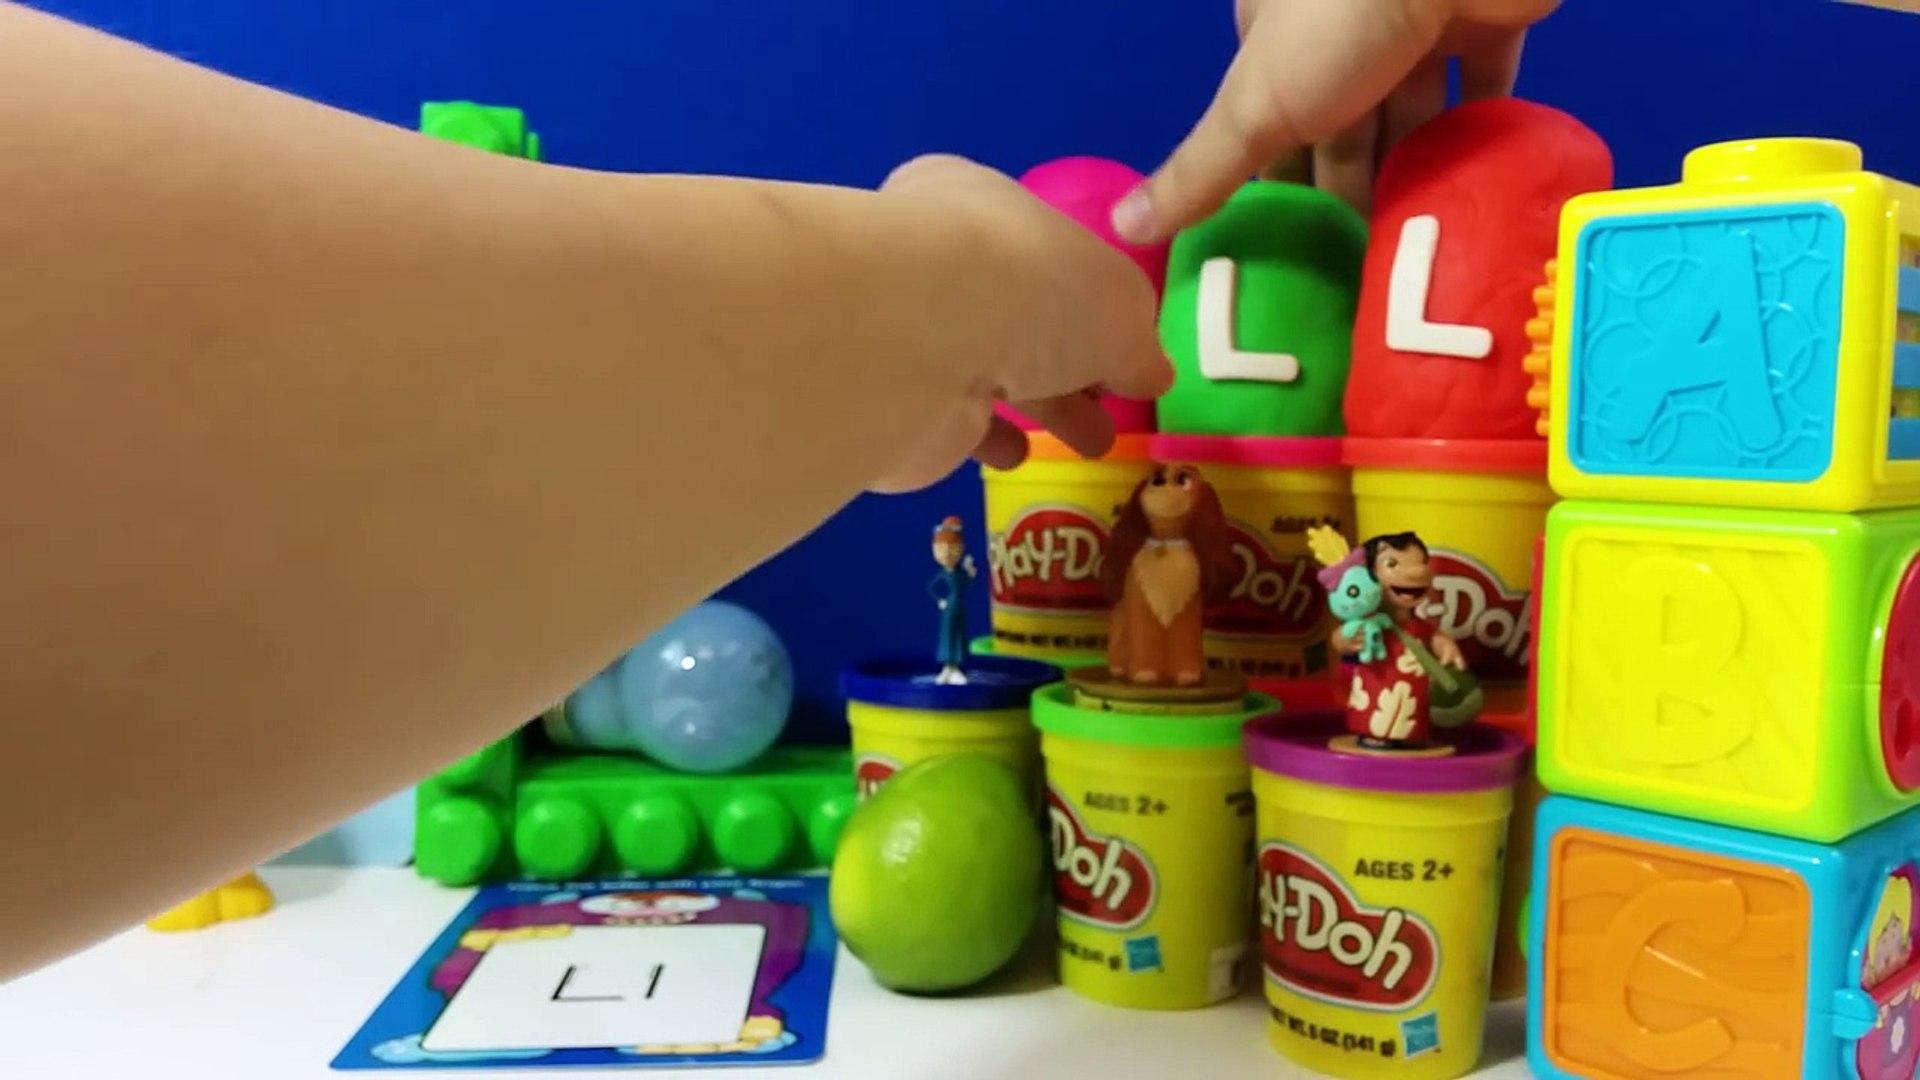 The Letter L with ABC Surprise Eggs - Luke Skywalker Lilo Lightning McQueen Lady Lapras